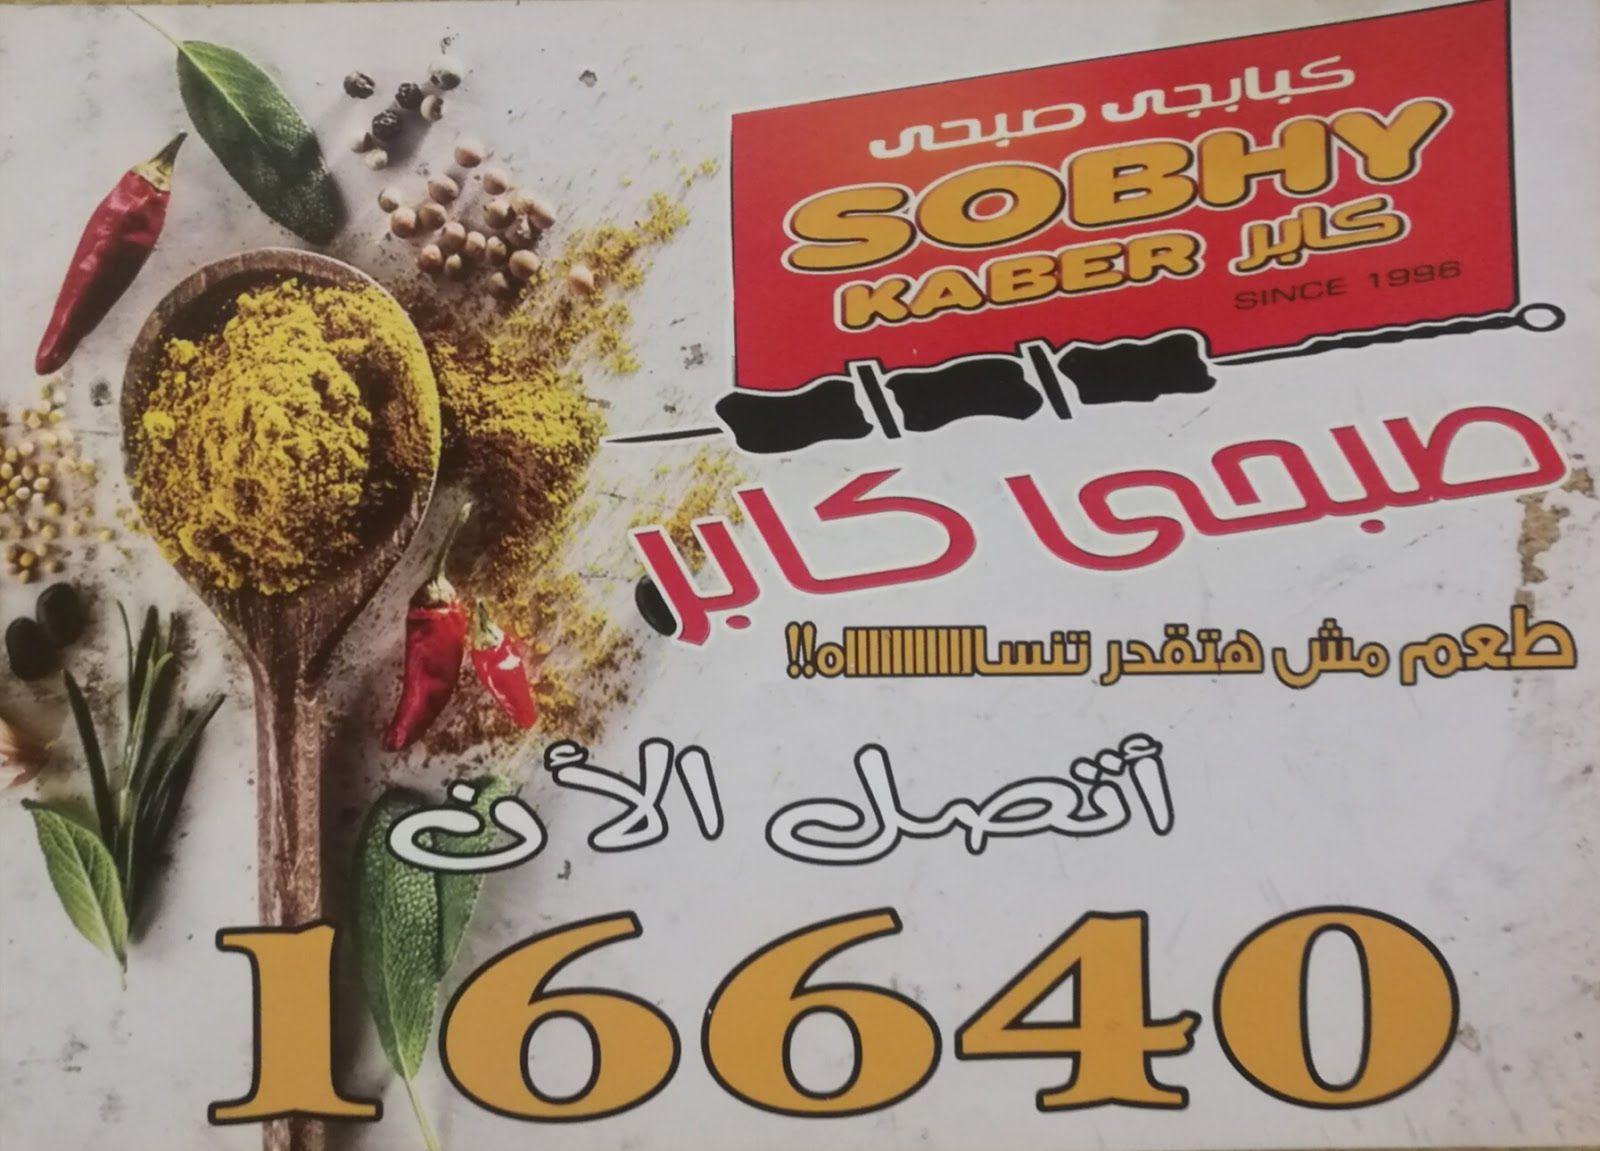 منيو مطعم صبحى كابر الجديدة ديسمبر 2018 روض الفرج شبرا مصر Book Cover